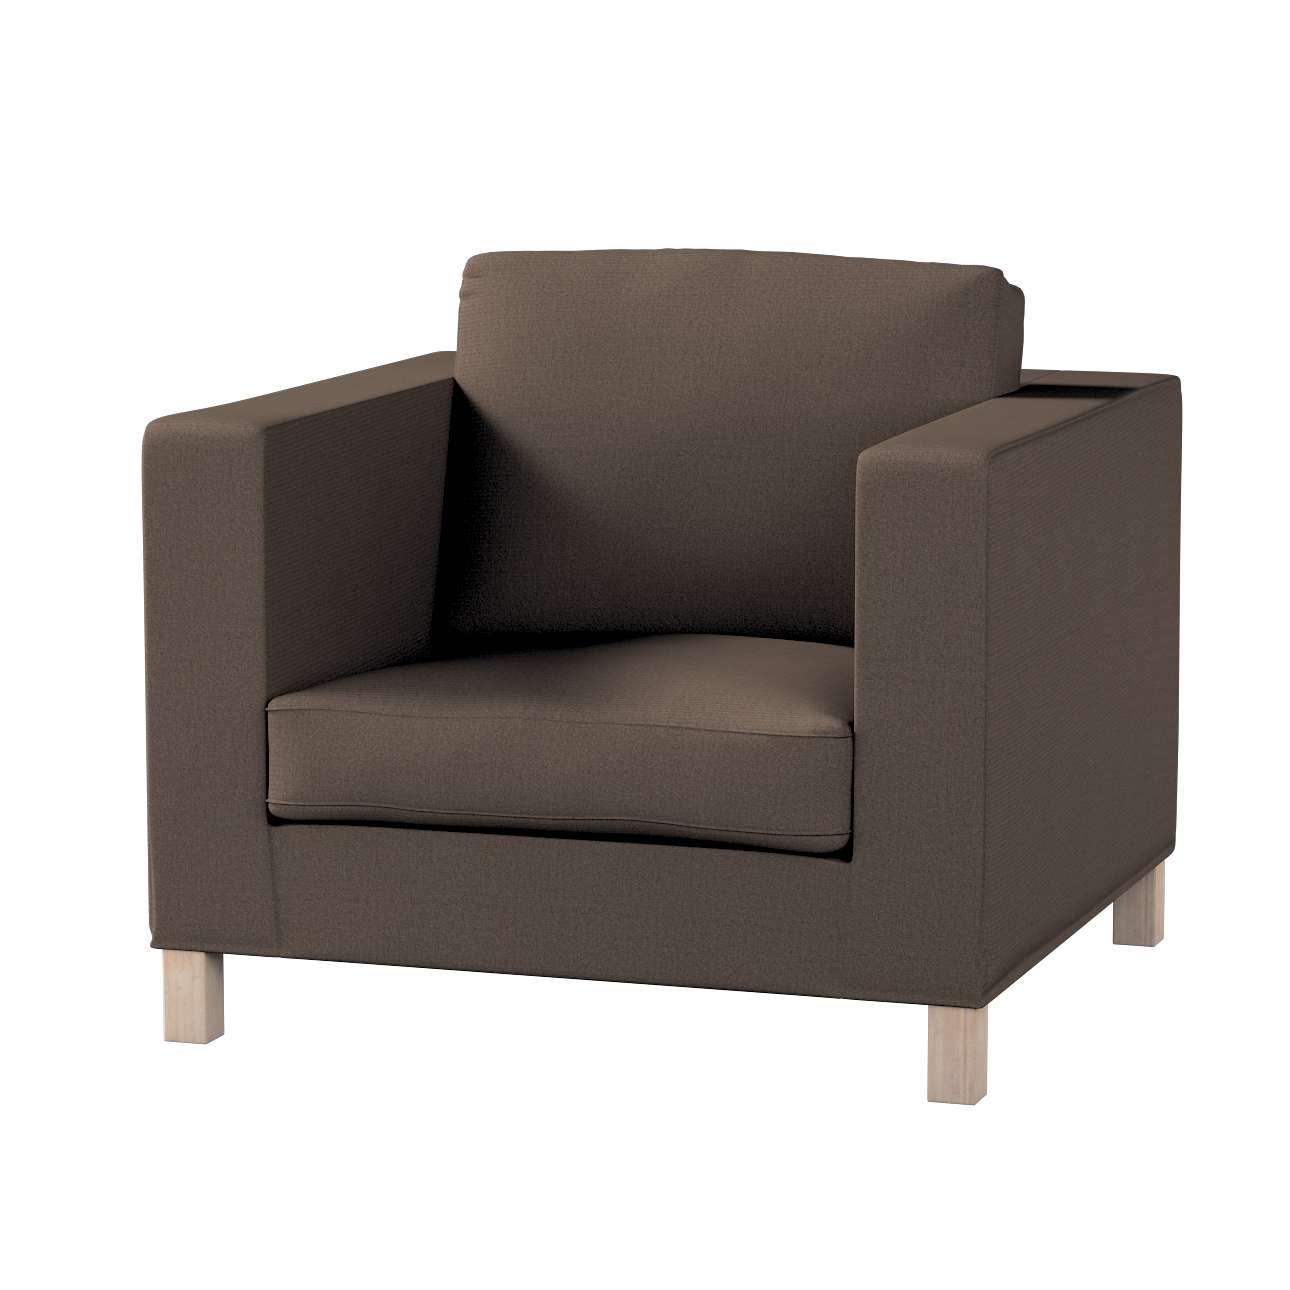 Pokrowiec na fotel Karlanda, krótki fotel Karlanda w kolekcji Etna , tkanina: 705-08